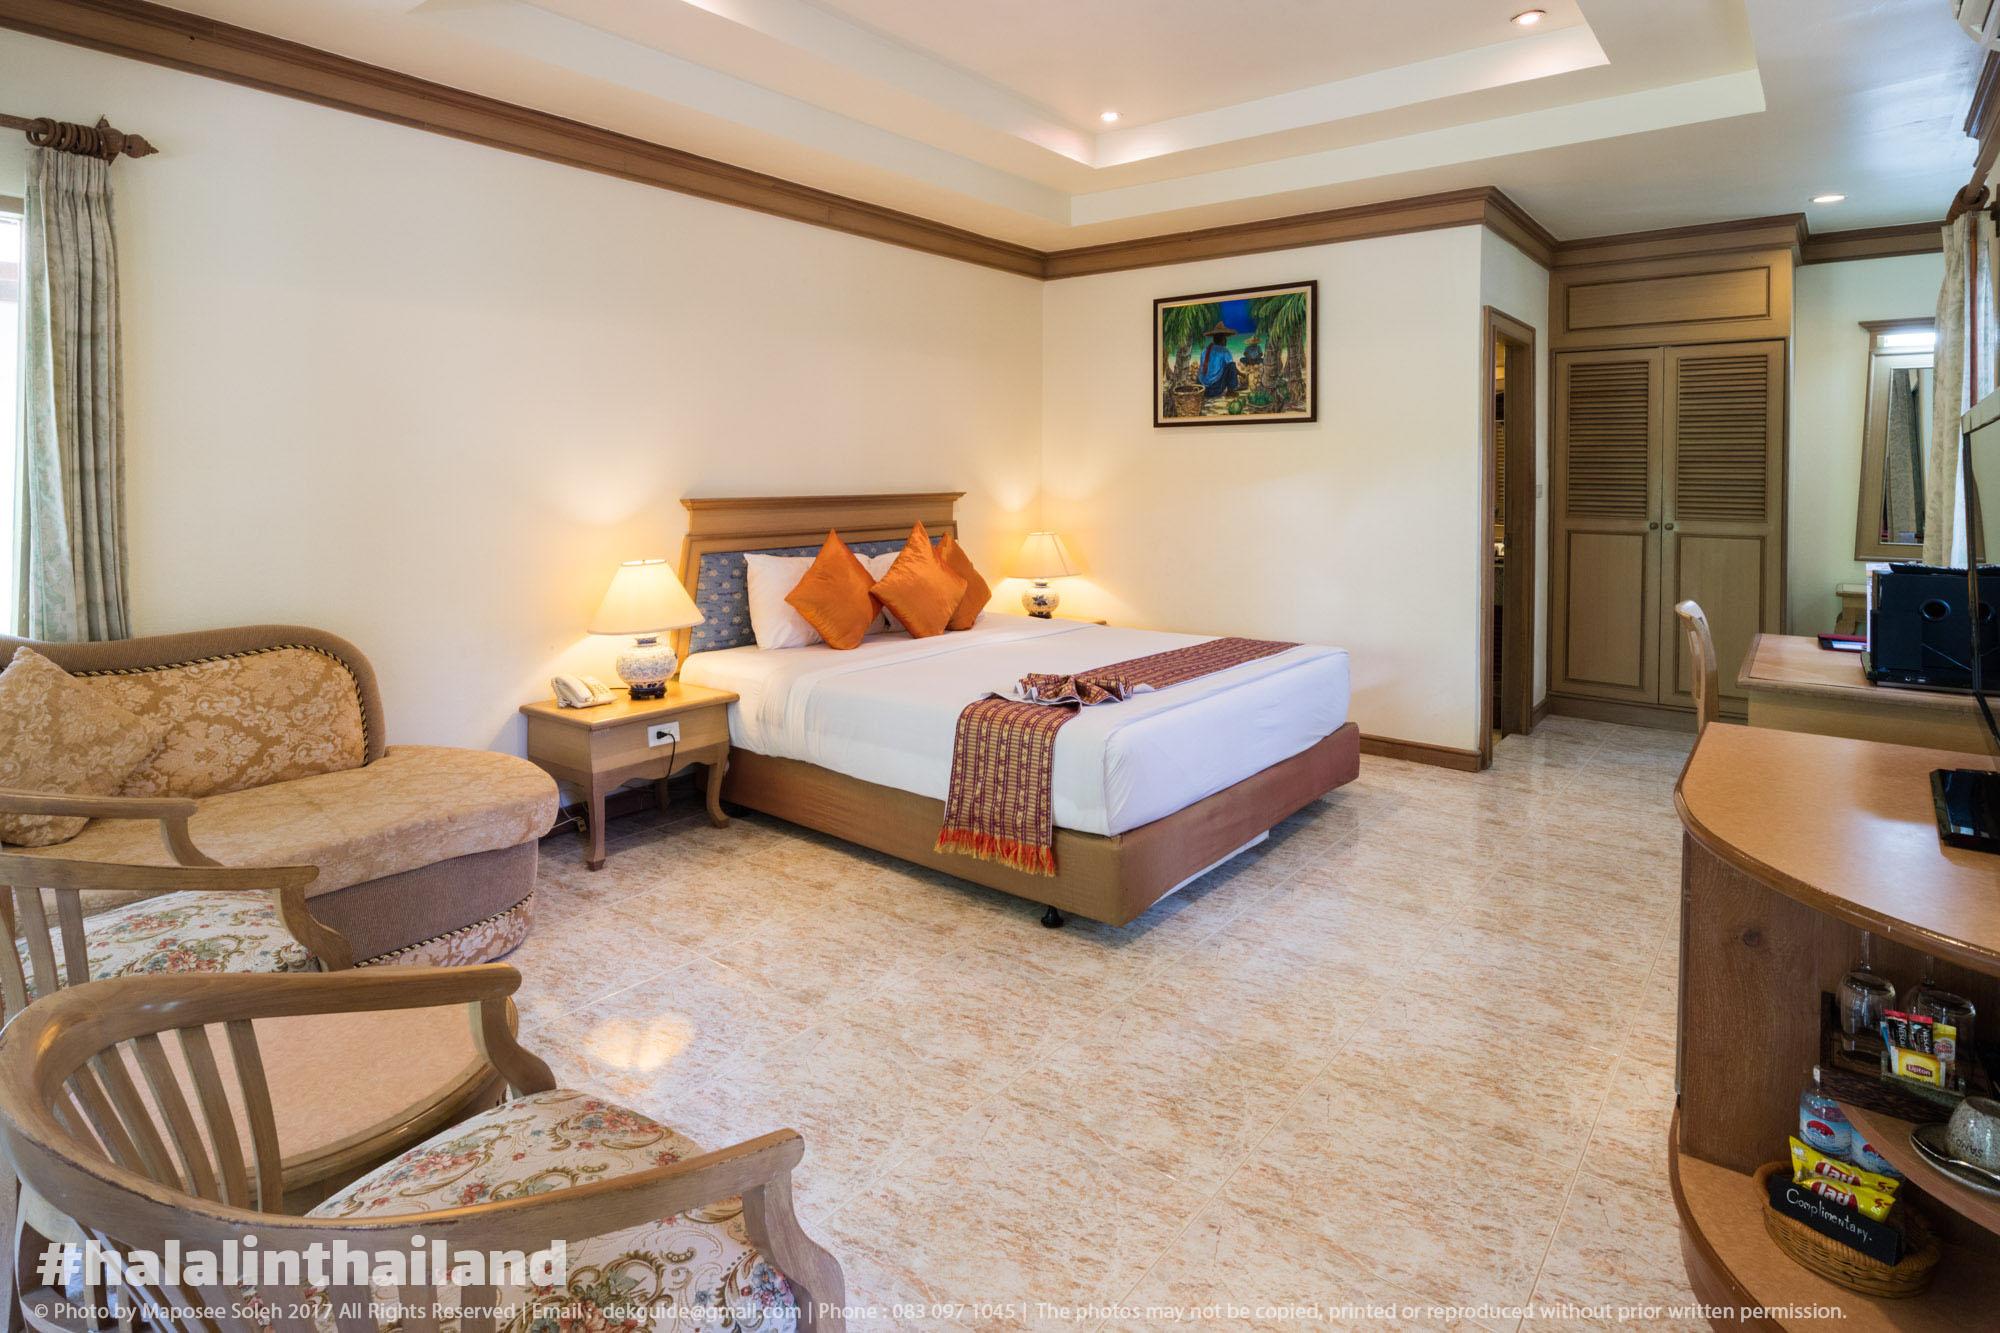 Sand Sea Resort Halal Hotel Krabi